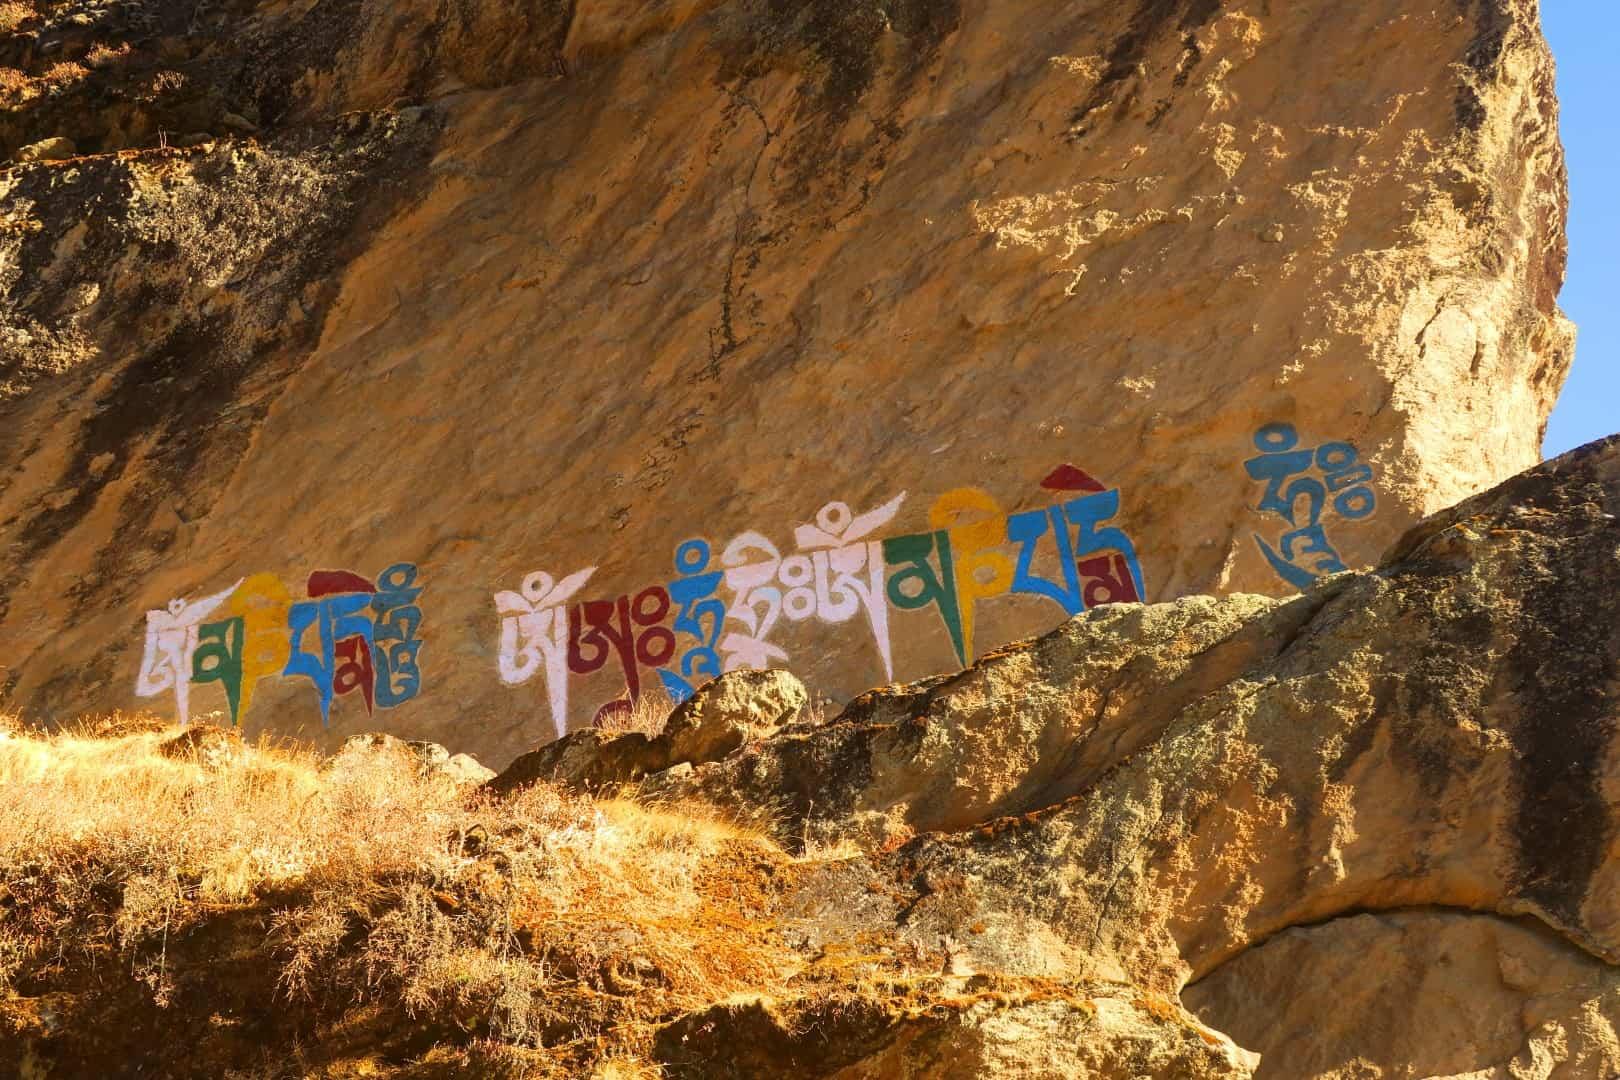 Spirituelles buddhistisches Graffiti auf Fels